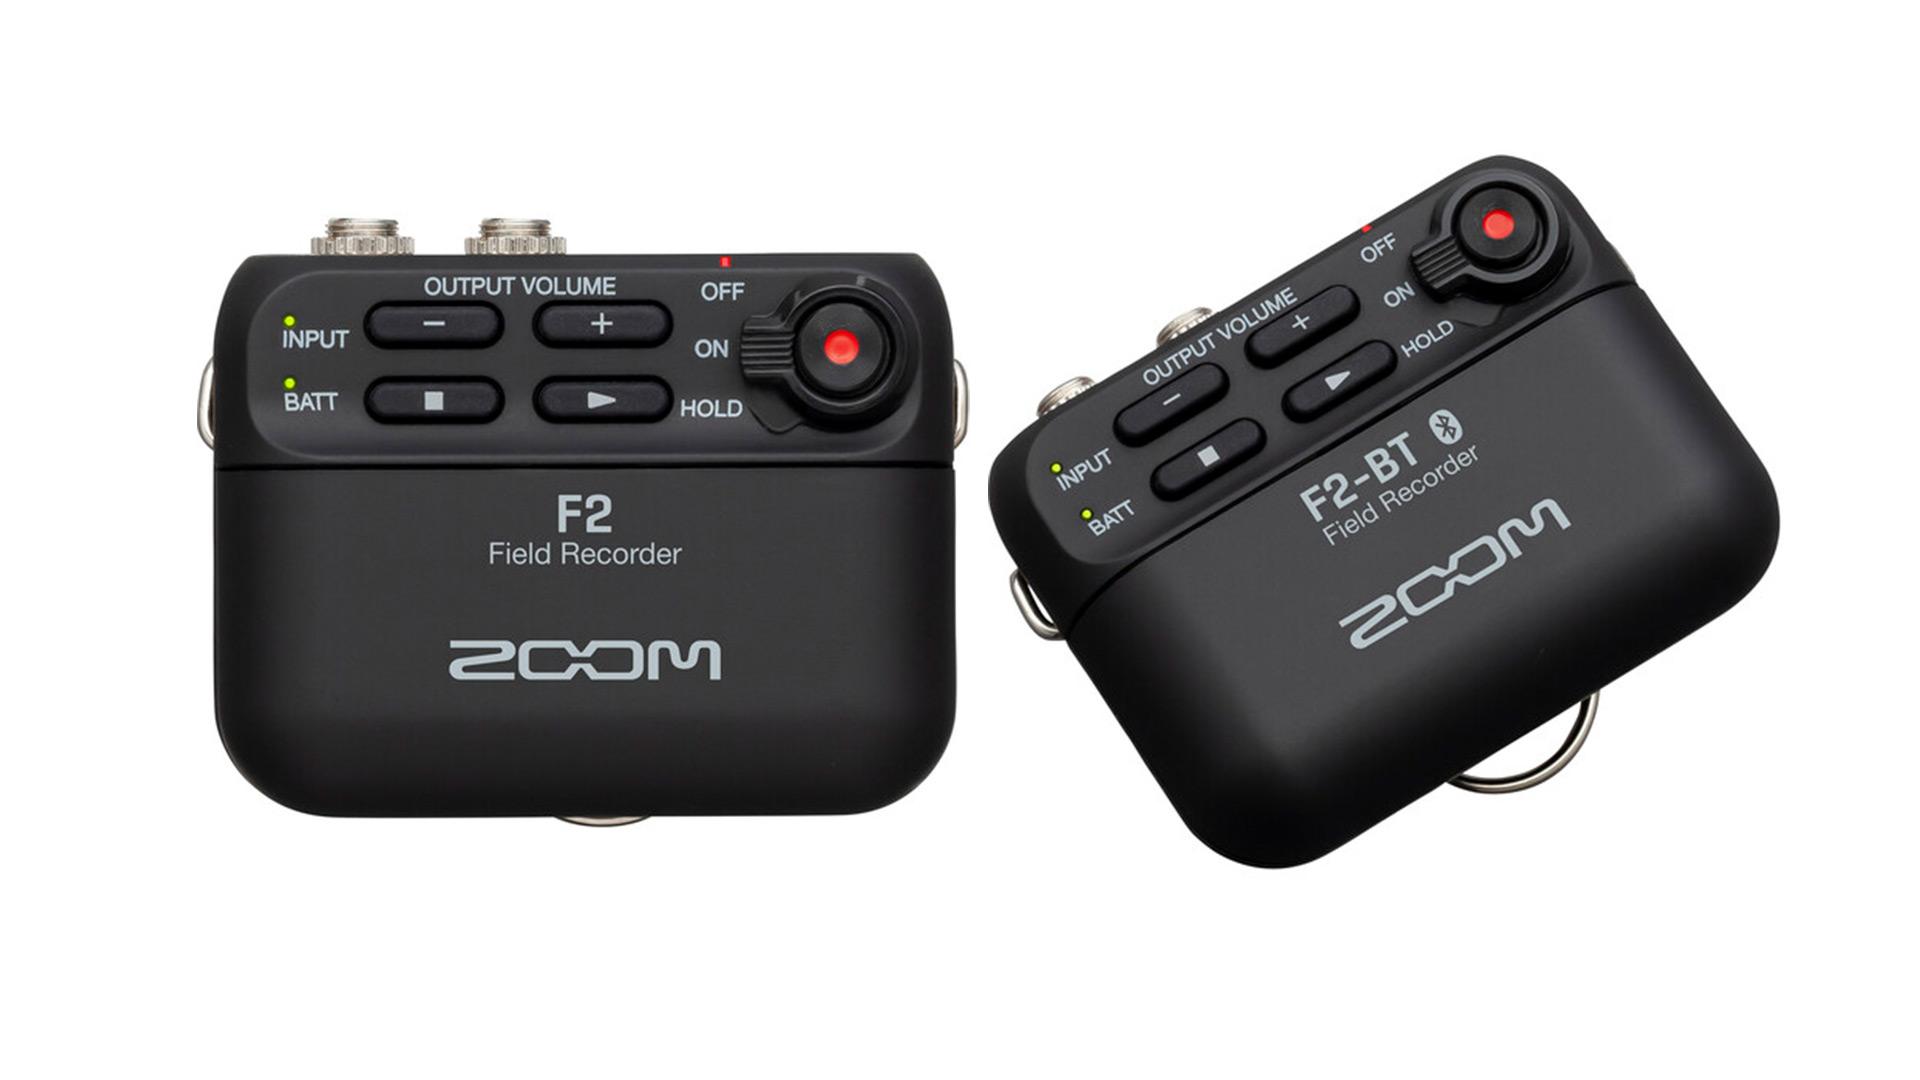 zoom f2 2